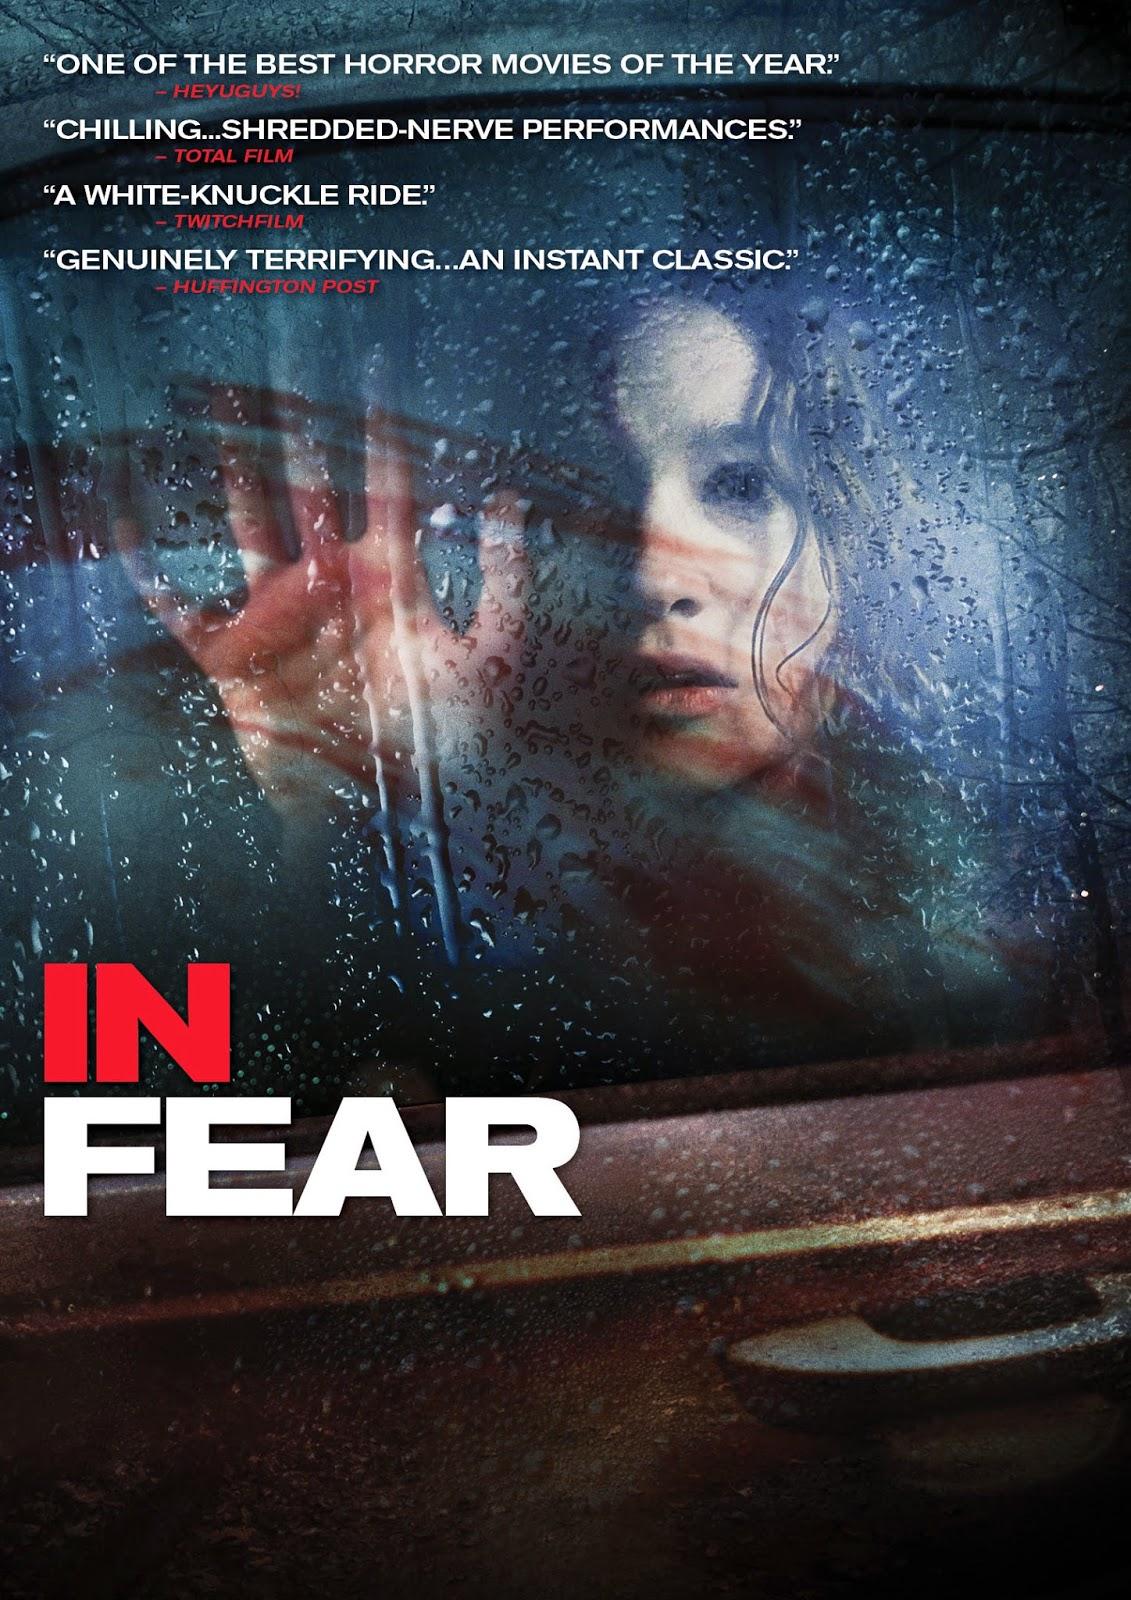 xem phim Mê Lộ - In Fear (2013) full hd vietsub online poster